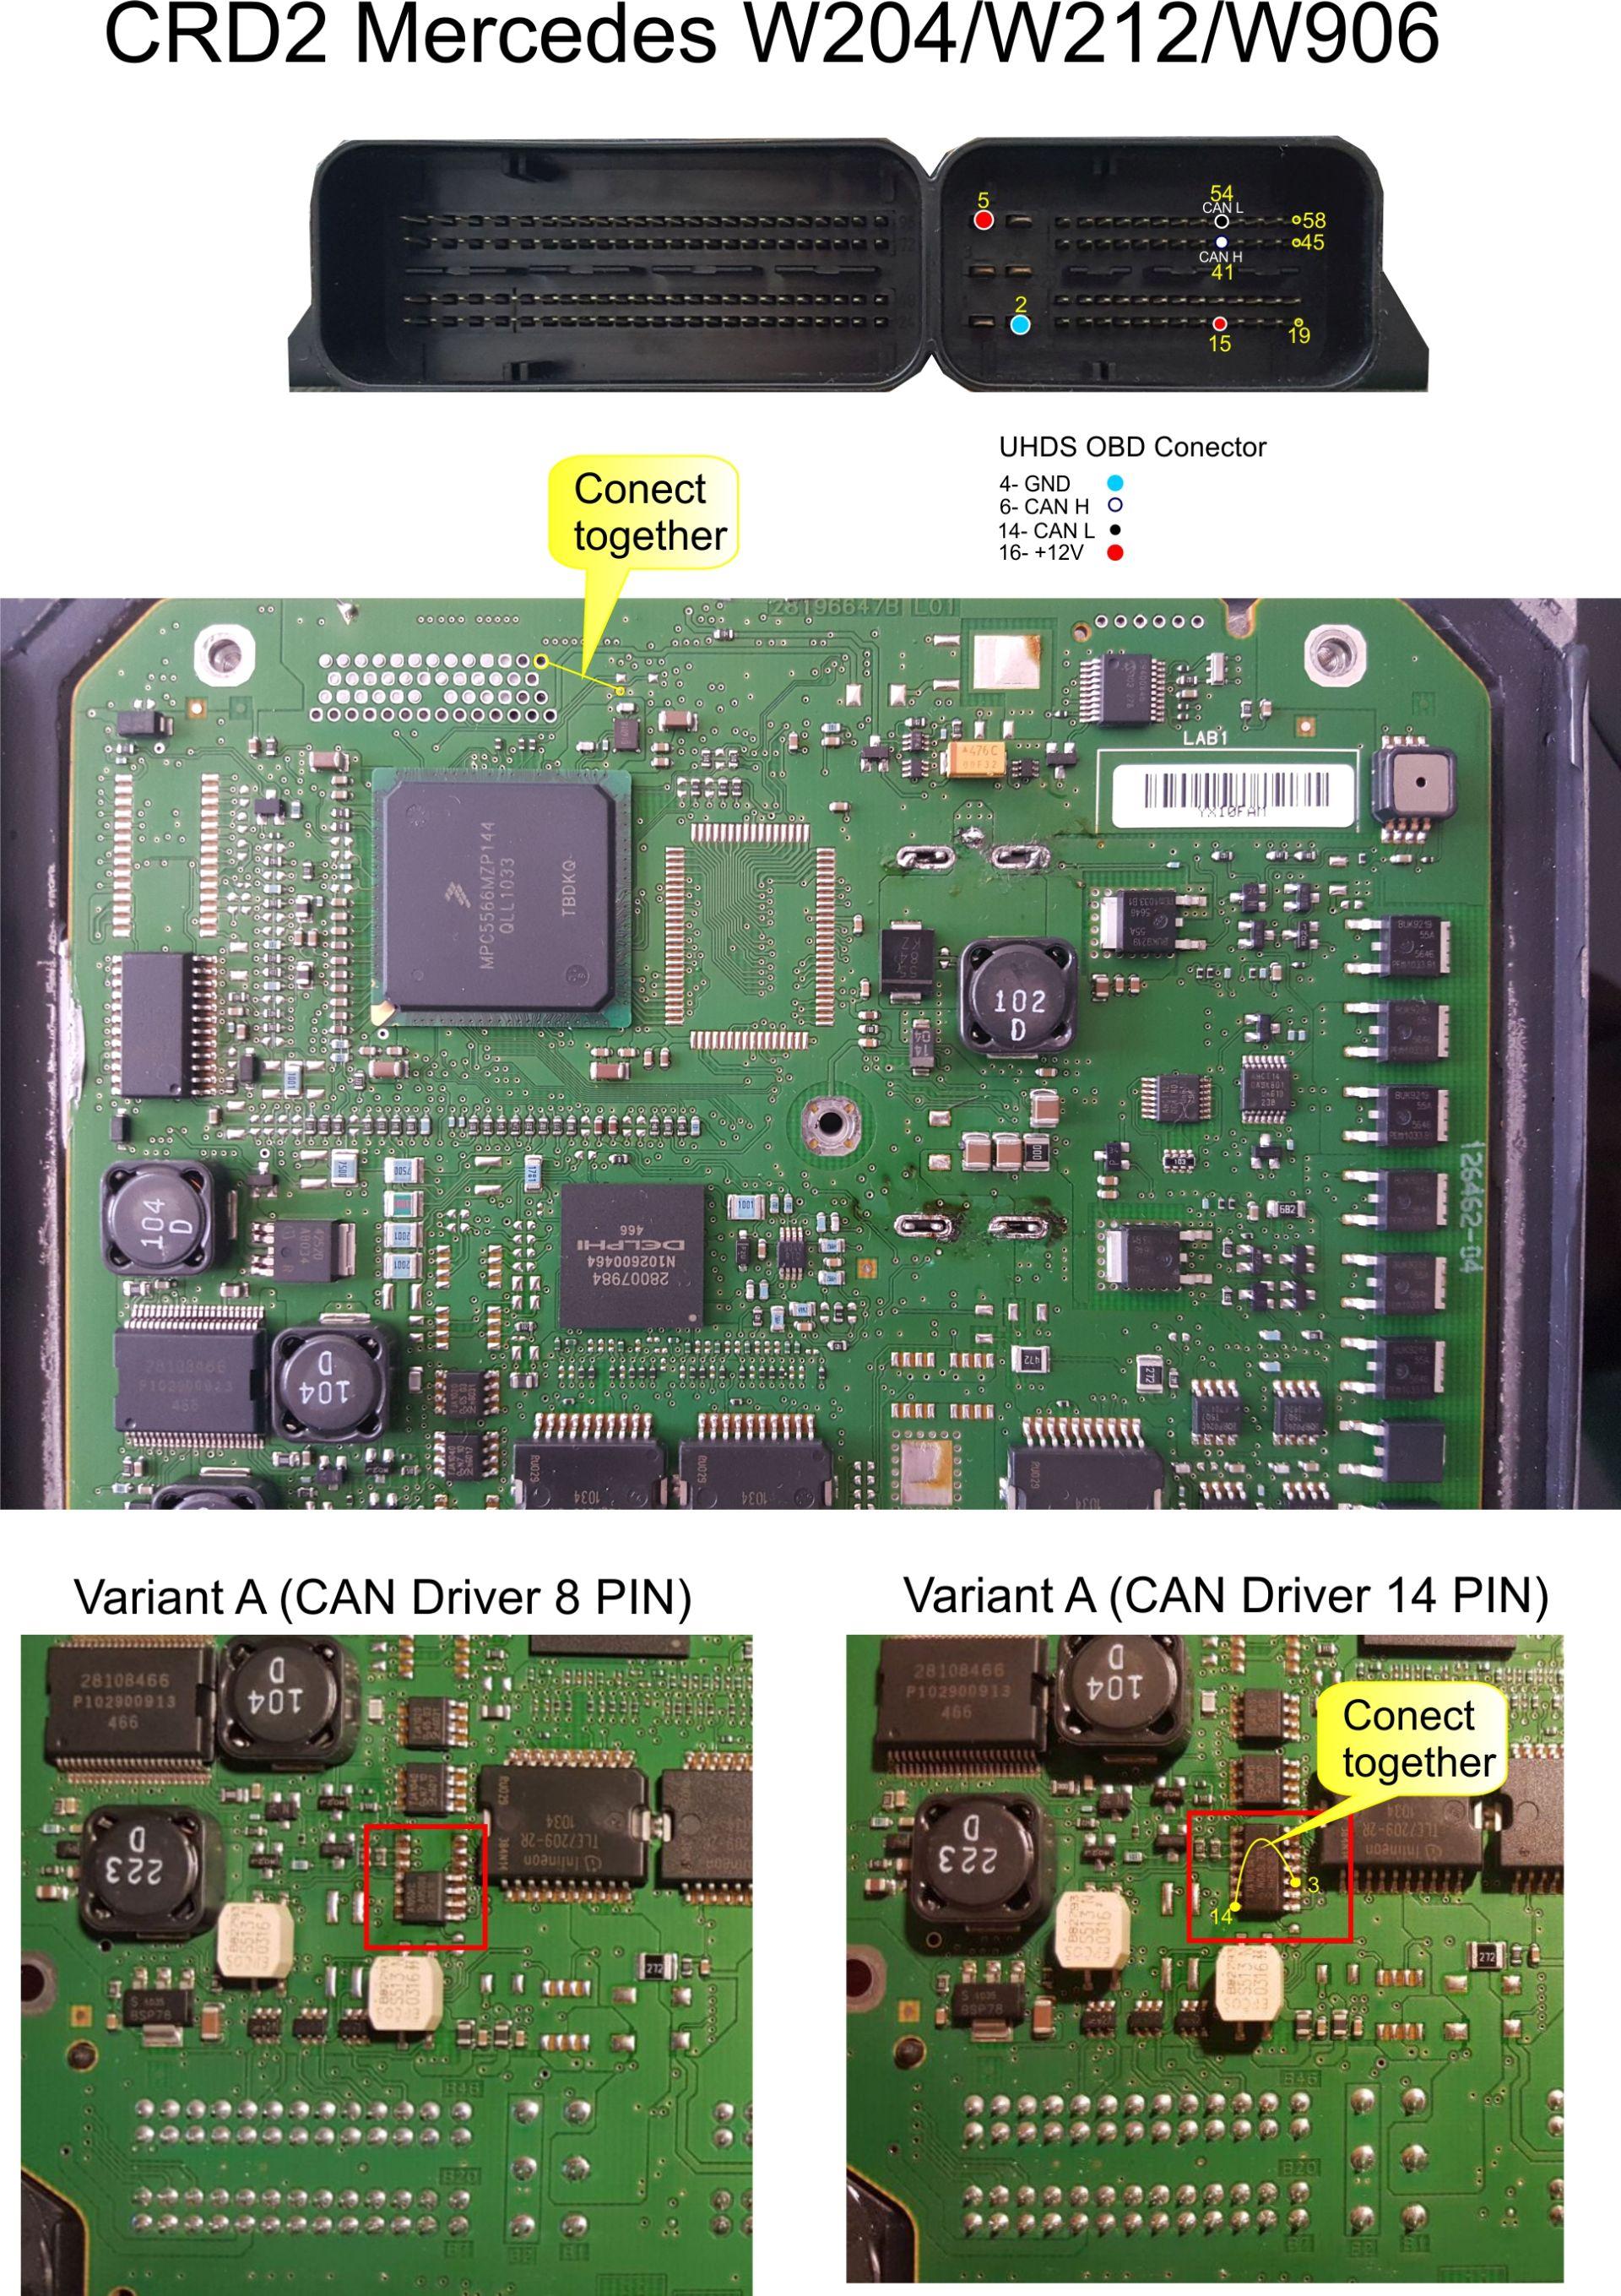 Iaw Manual Ecu Diagram Of All Years Ef2500 Yamaha Power Equipment Generator Array Programmers Smok Eu0015 Mercedes Crd2 Delphi Rh Autodijagnostika Biz